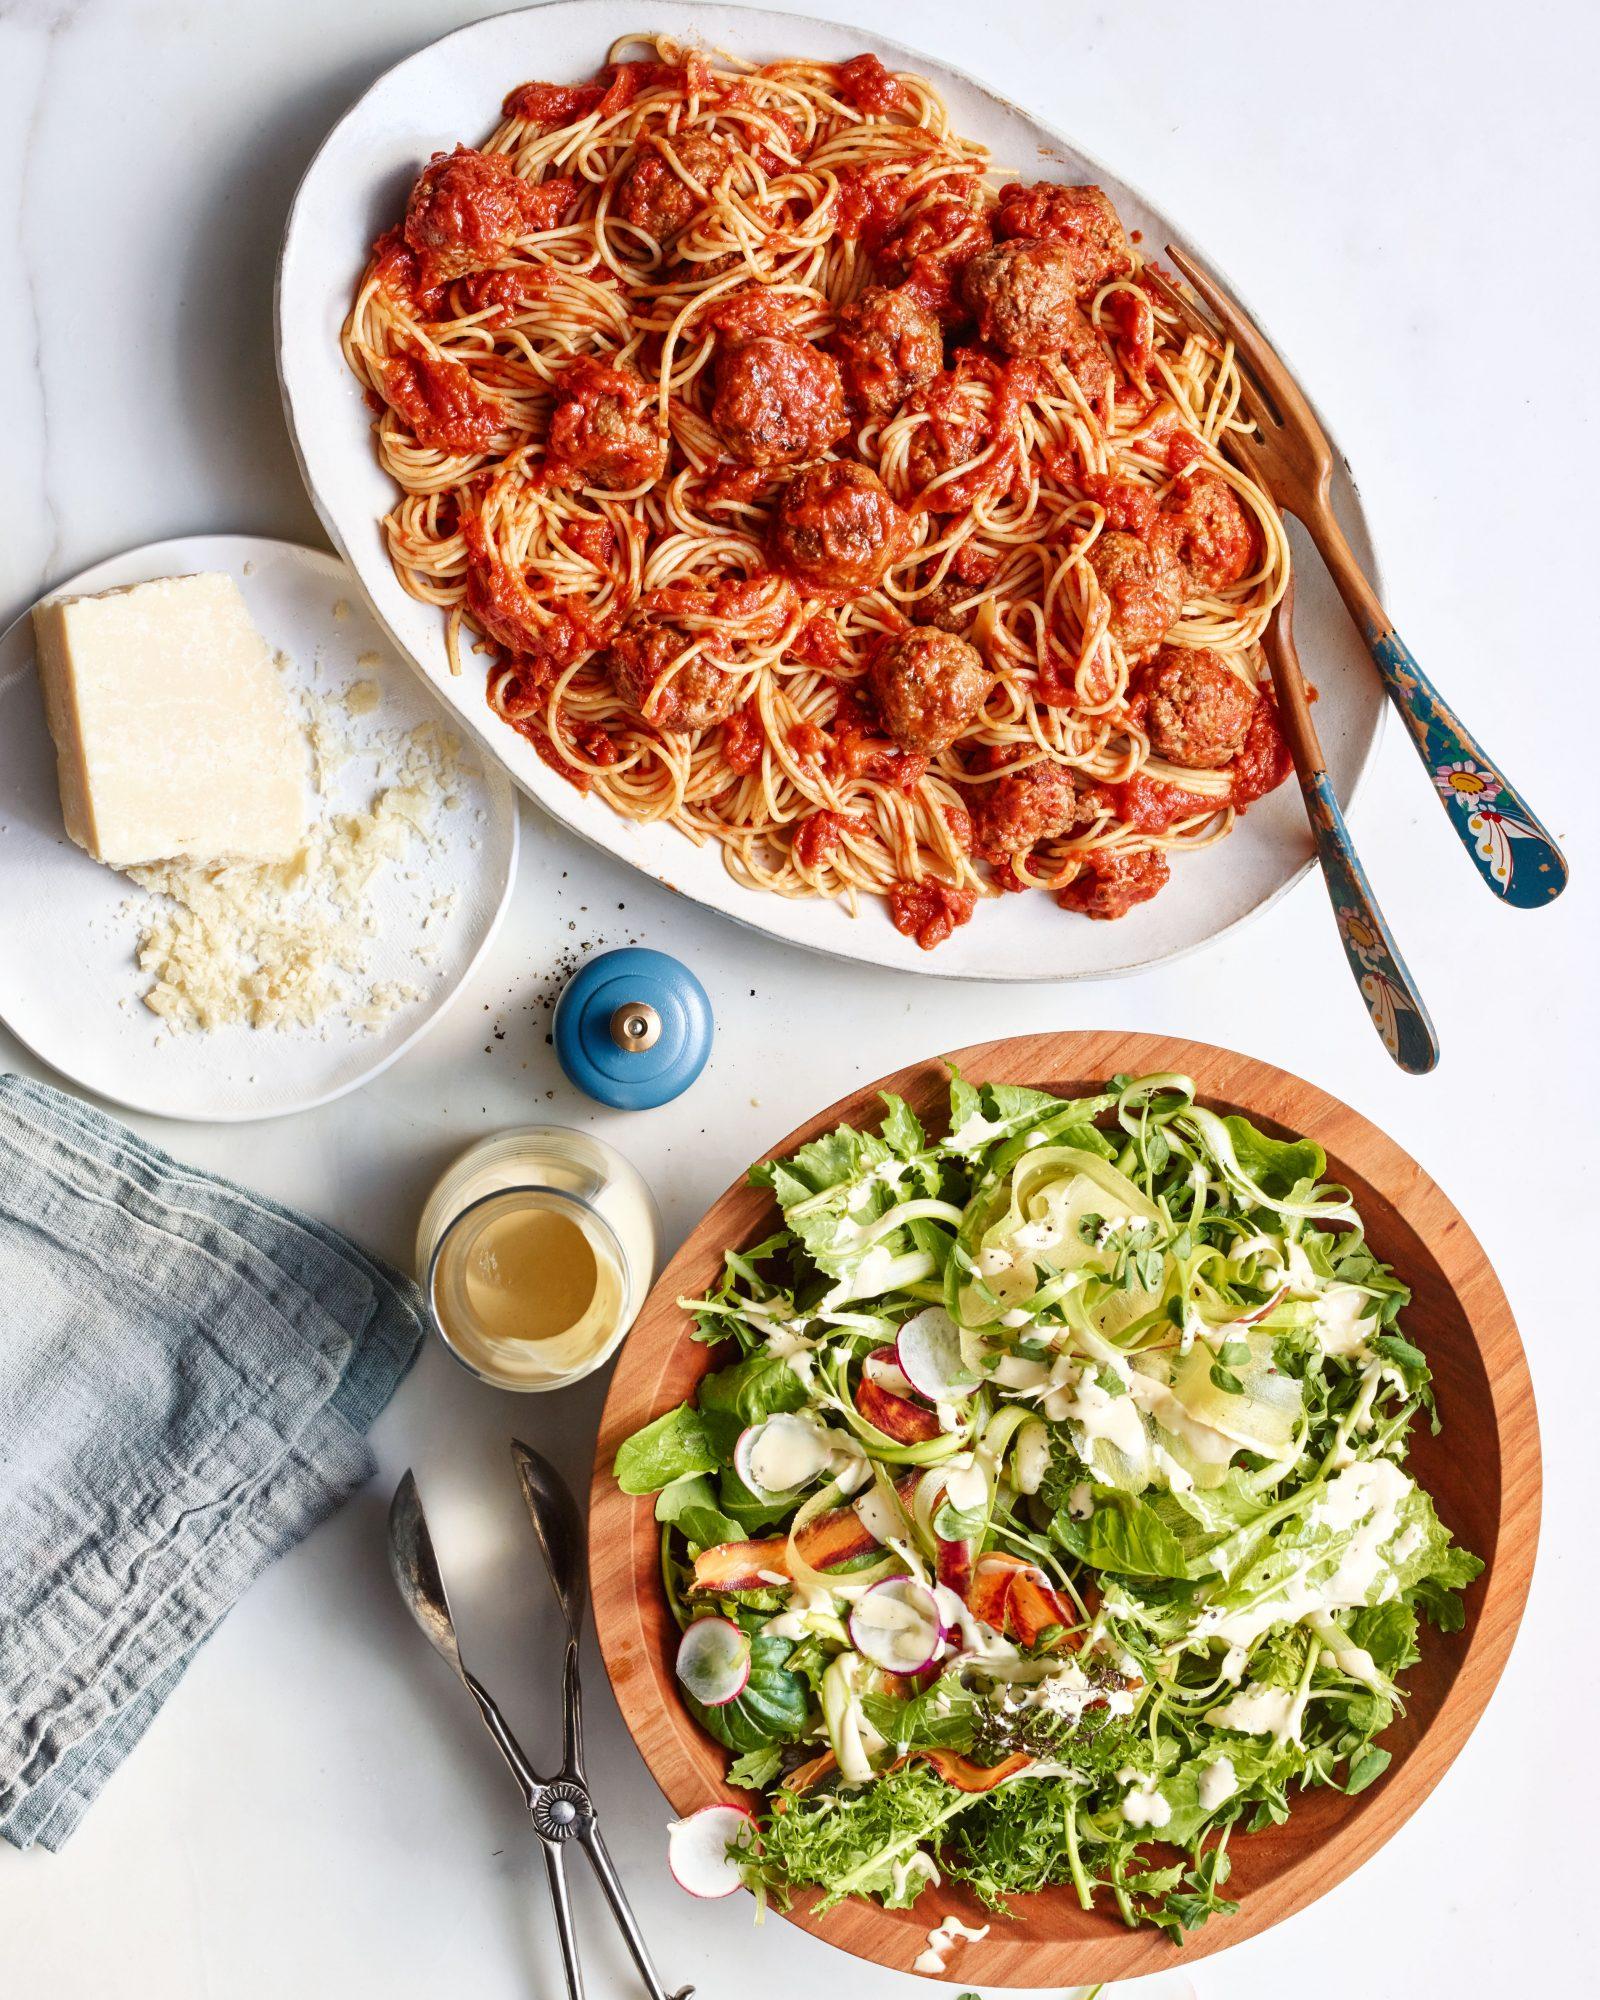 Spaghetti with Make-Ahead Meatballs